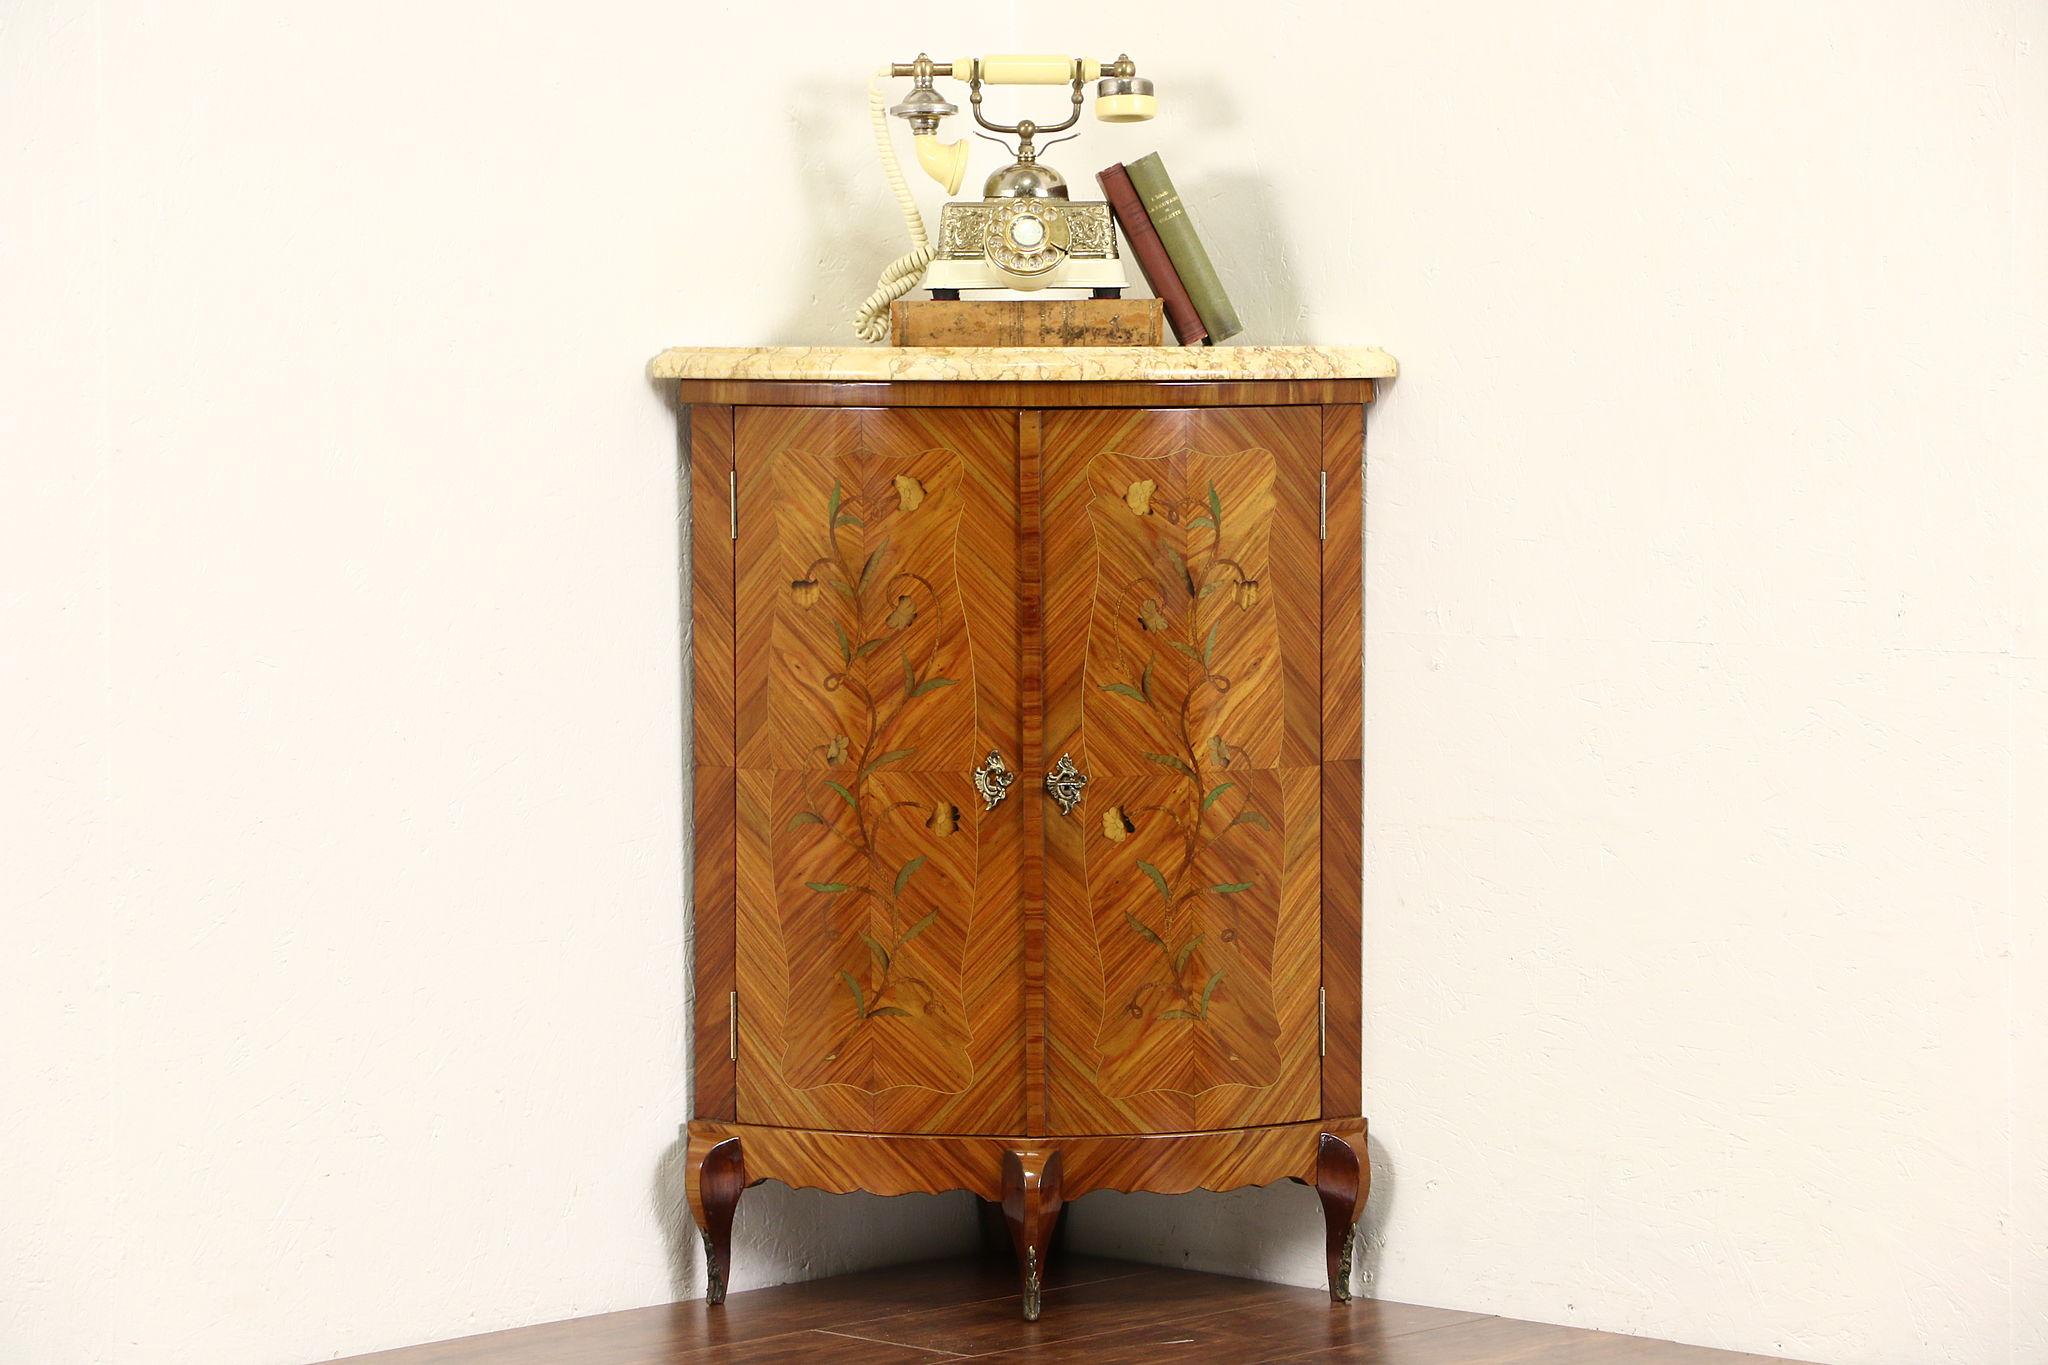 Vintage Corner Cabinet Italian Rosewood Marquetry 1950 Vintage Corner Cabinet Marble Top